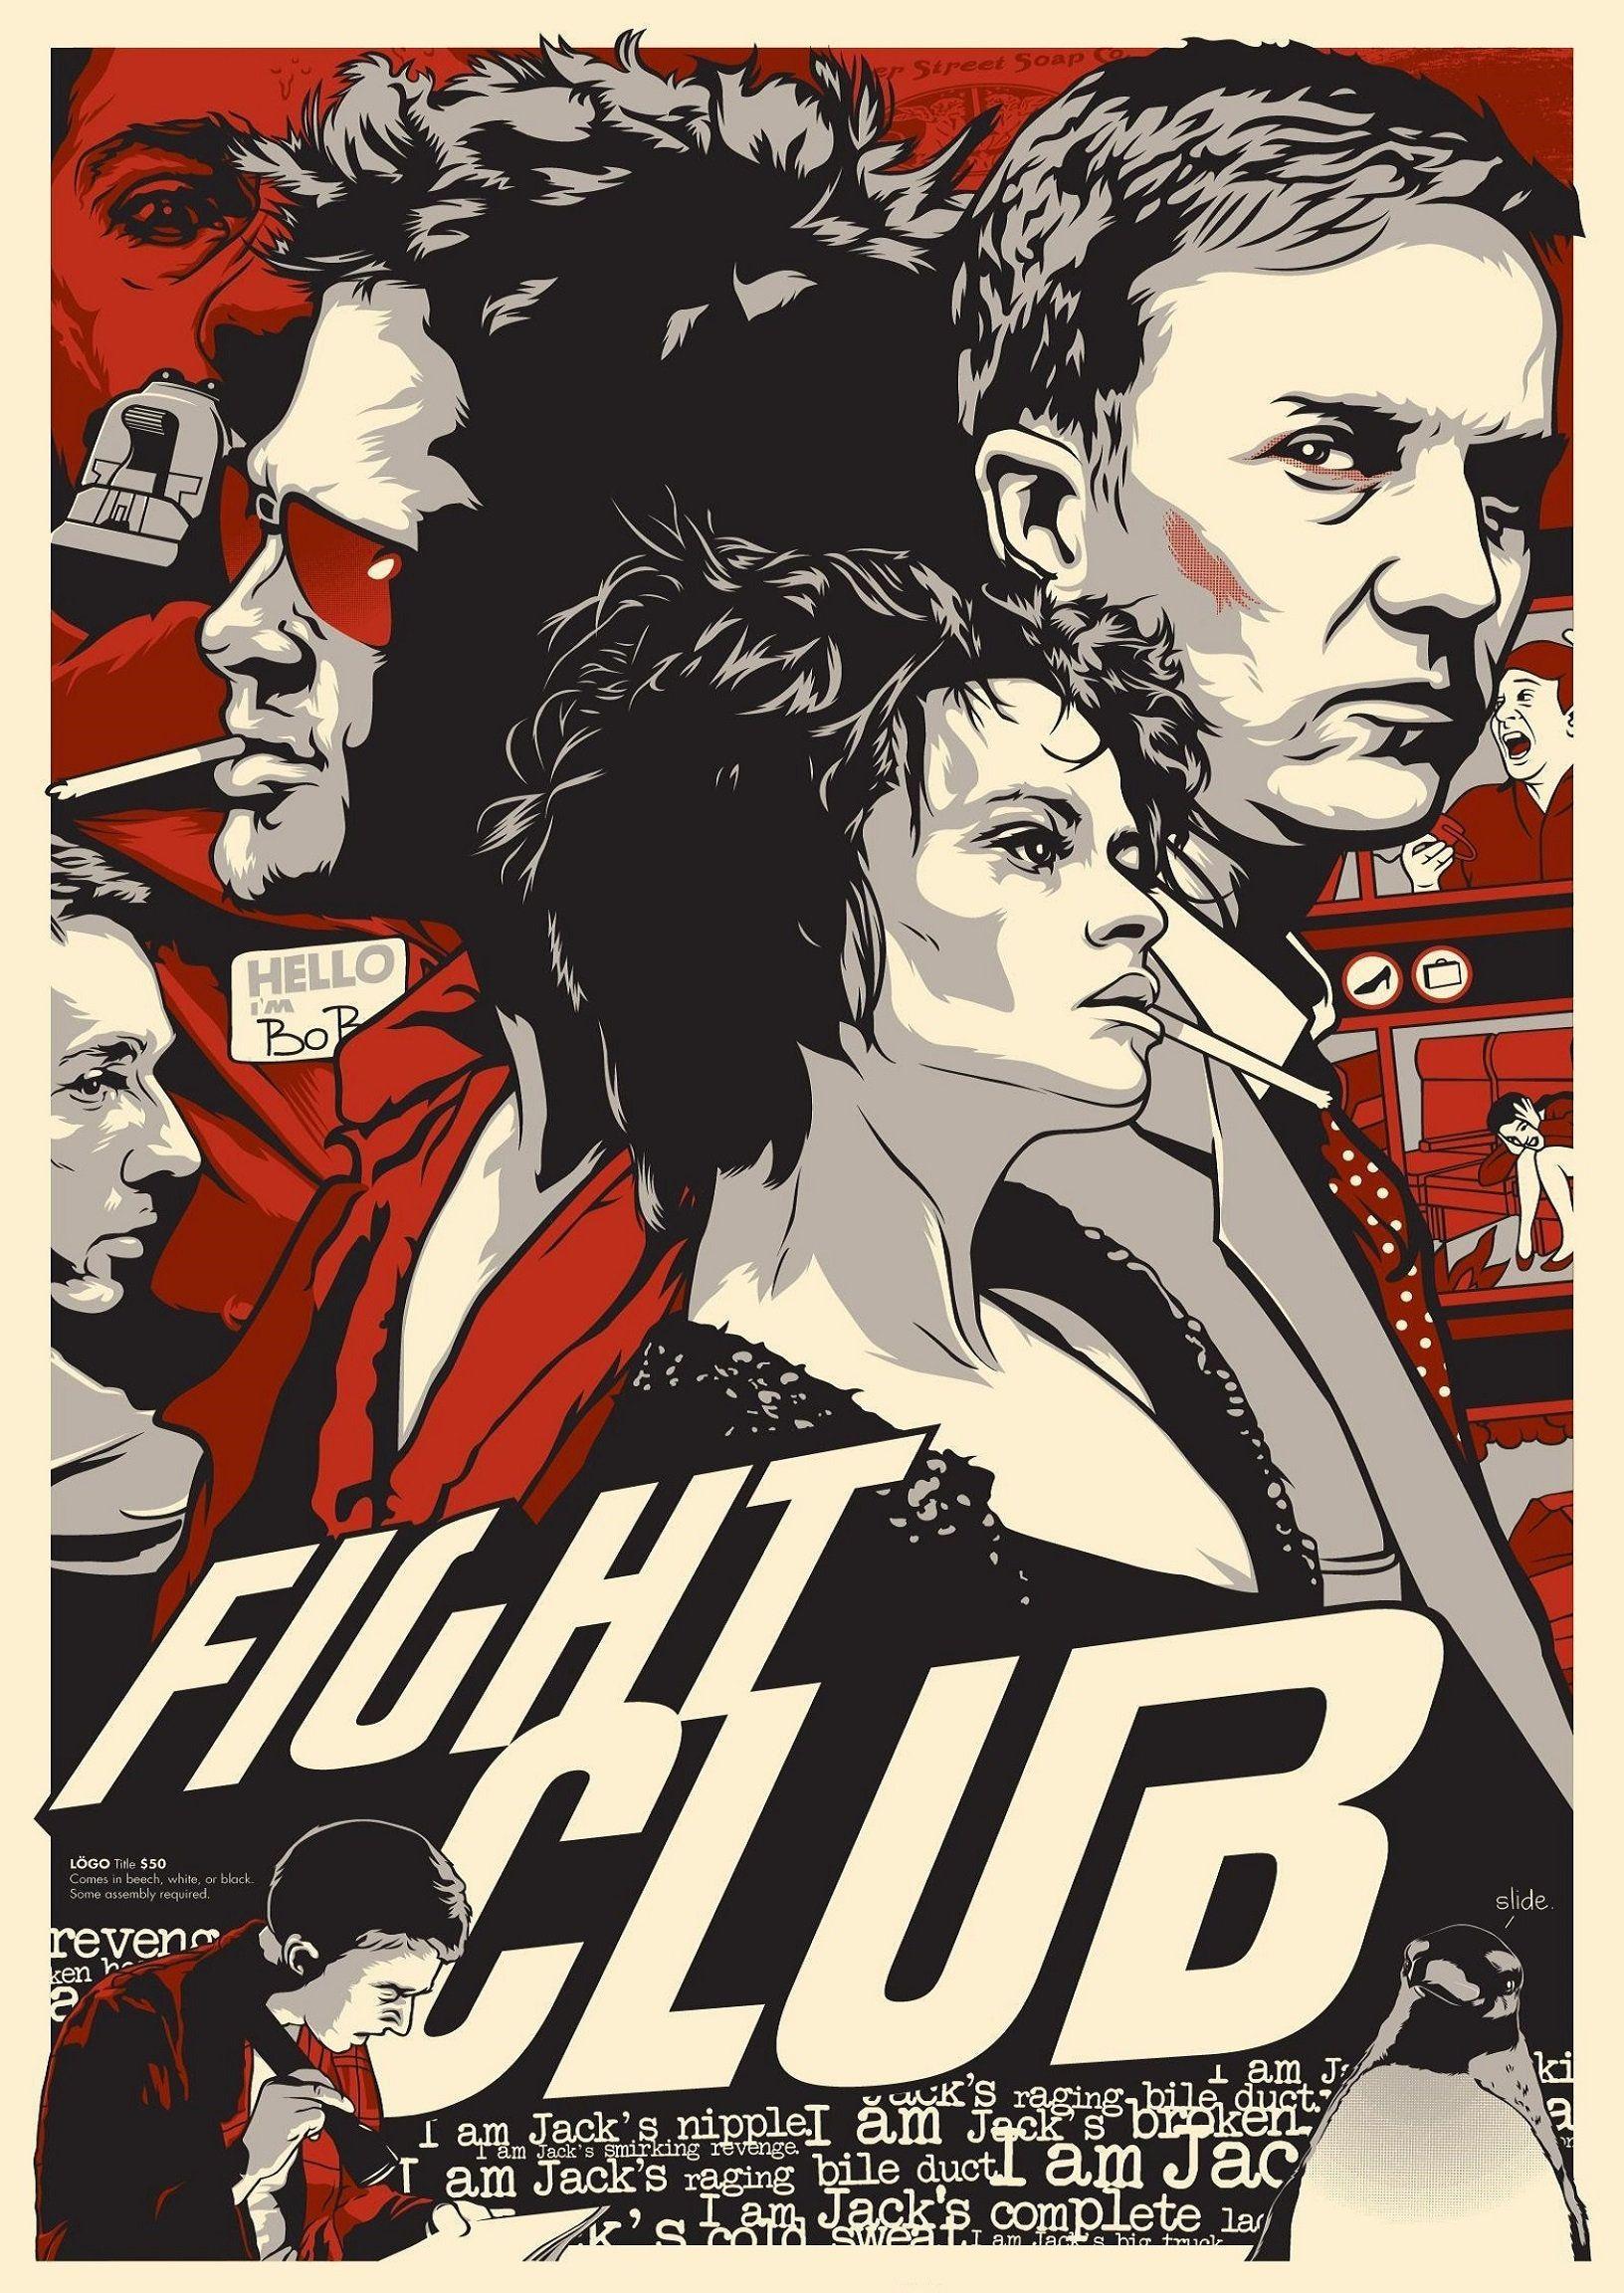 Fight Club Soap Brat Pitt Edward Norton Action Artwork Design Graphic Minimal Minimalist Alternative Poster Print Movie Film